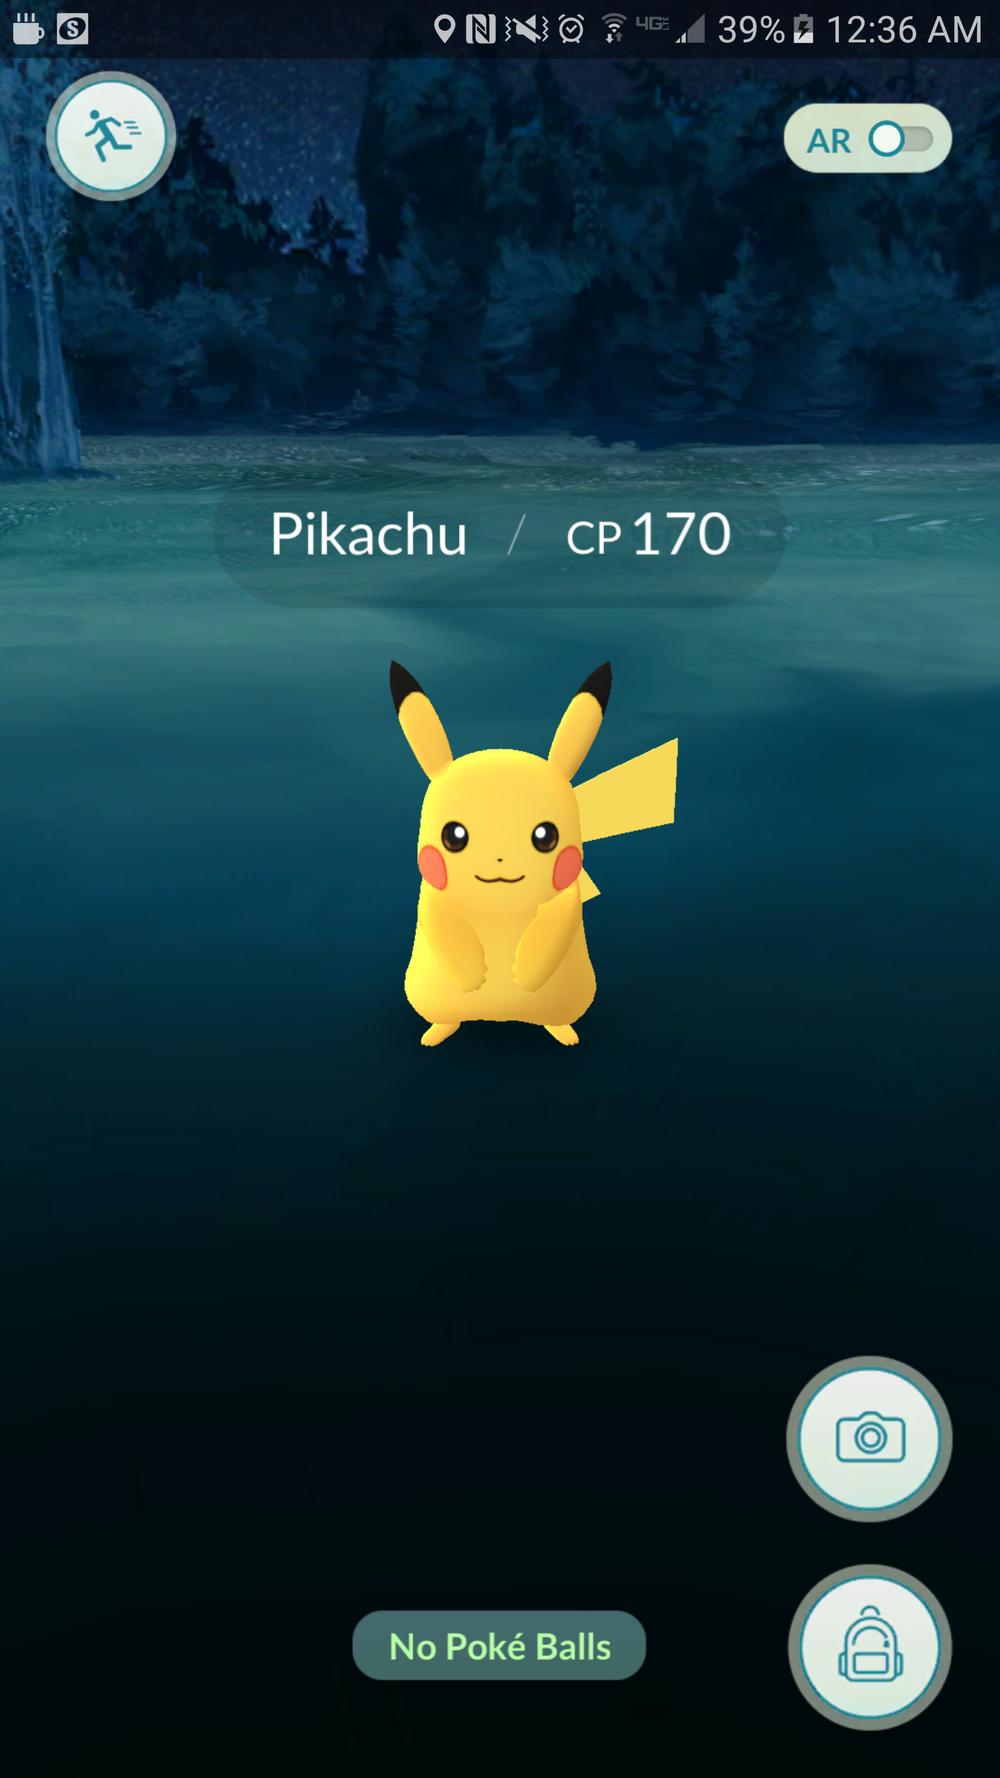 "Pokemon Go screenshot; Pikachu in capture screen, message at bottom says ""No Poke Balls"""